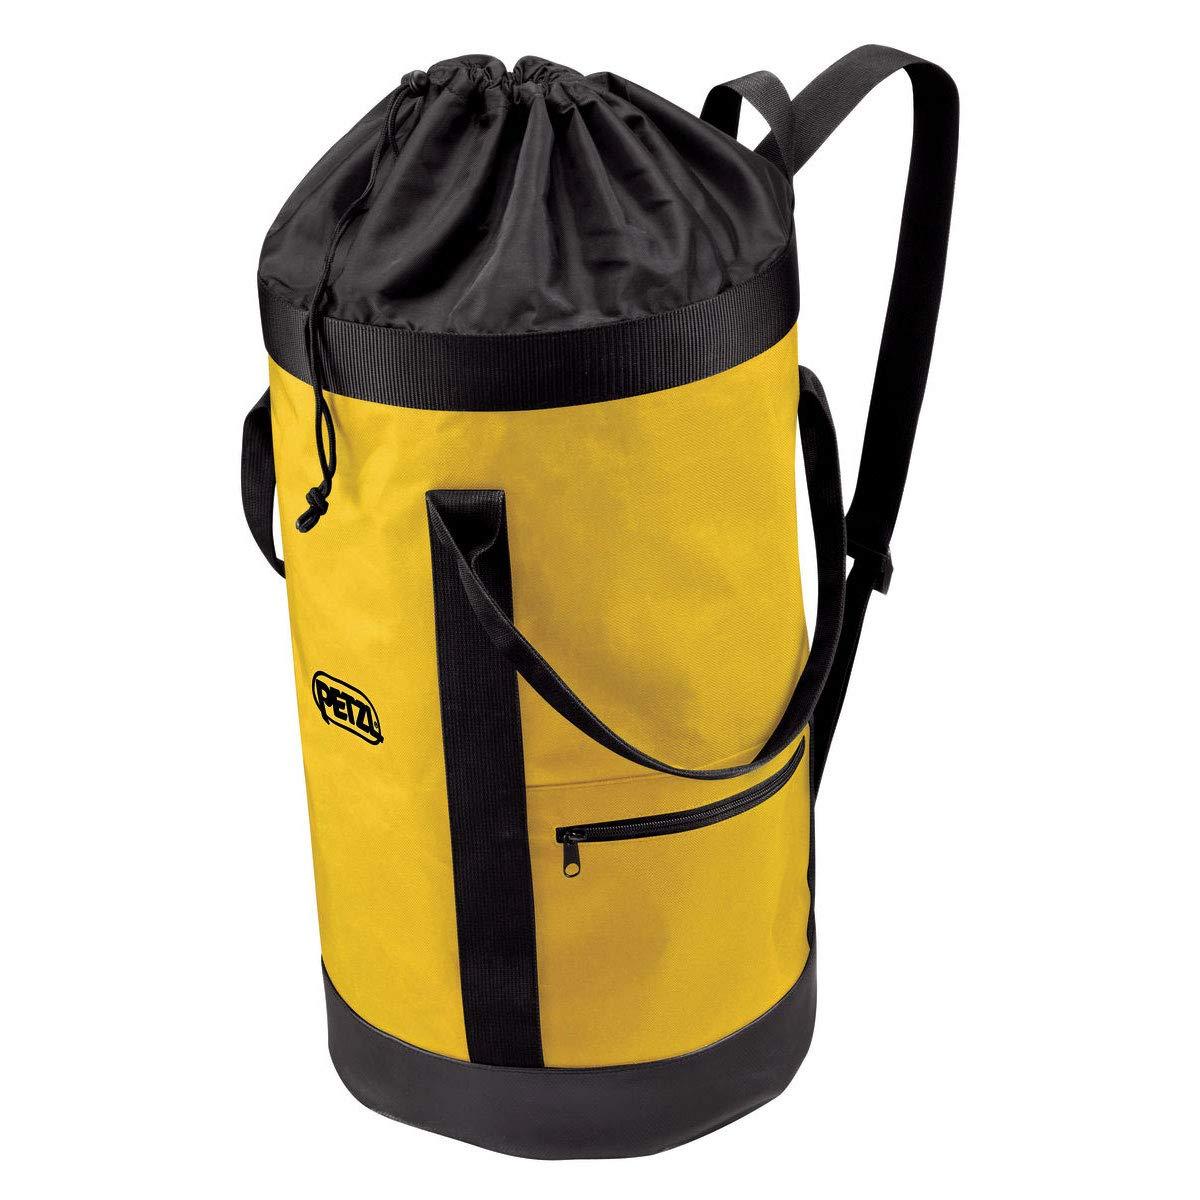 BOLUOYI Shoulder Bags for Women Under 29,Womens Tote Bags,Fashion Women Letter Canvas Messenger Bag Shoulder Bag Hand Bag Travel Bag,White